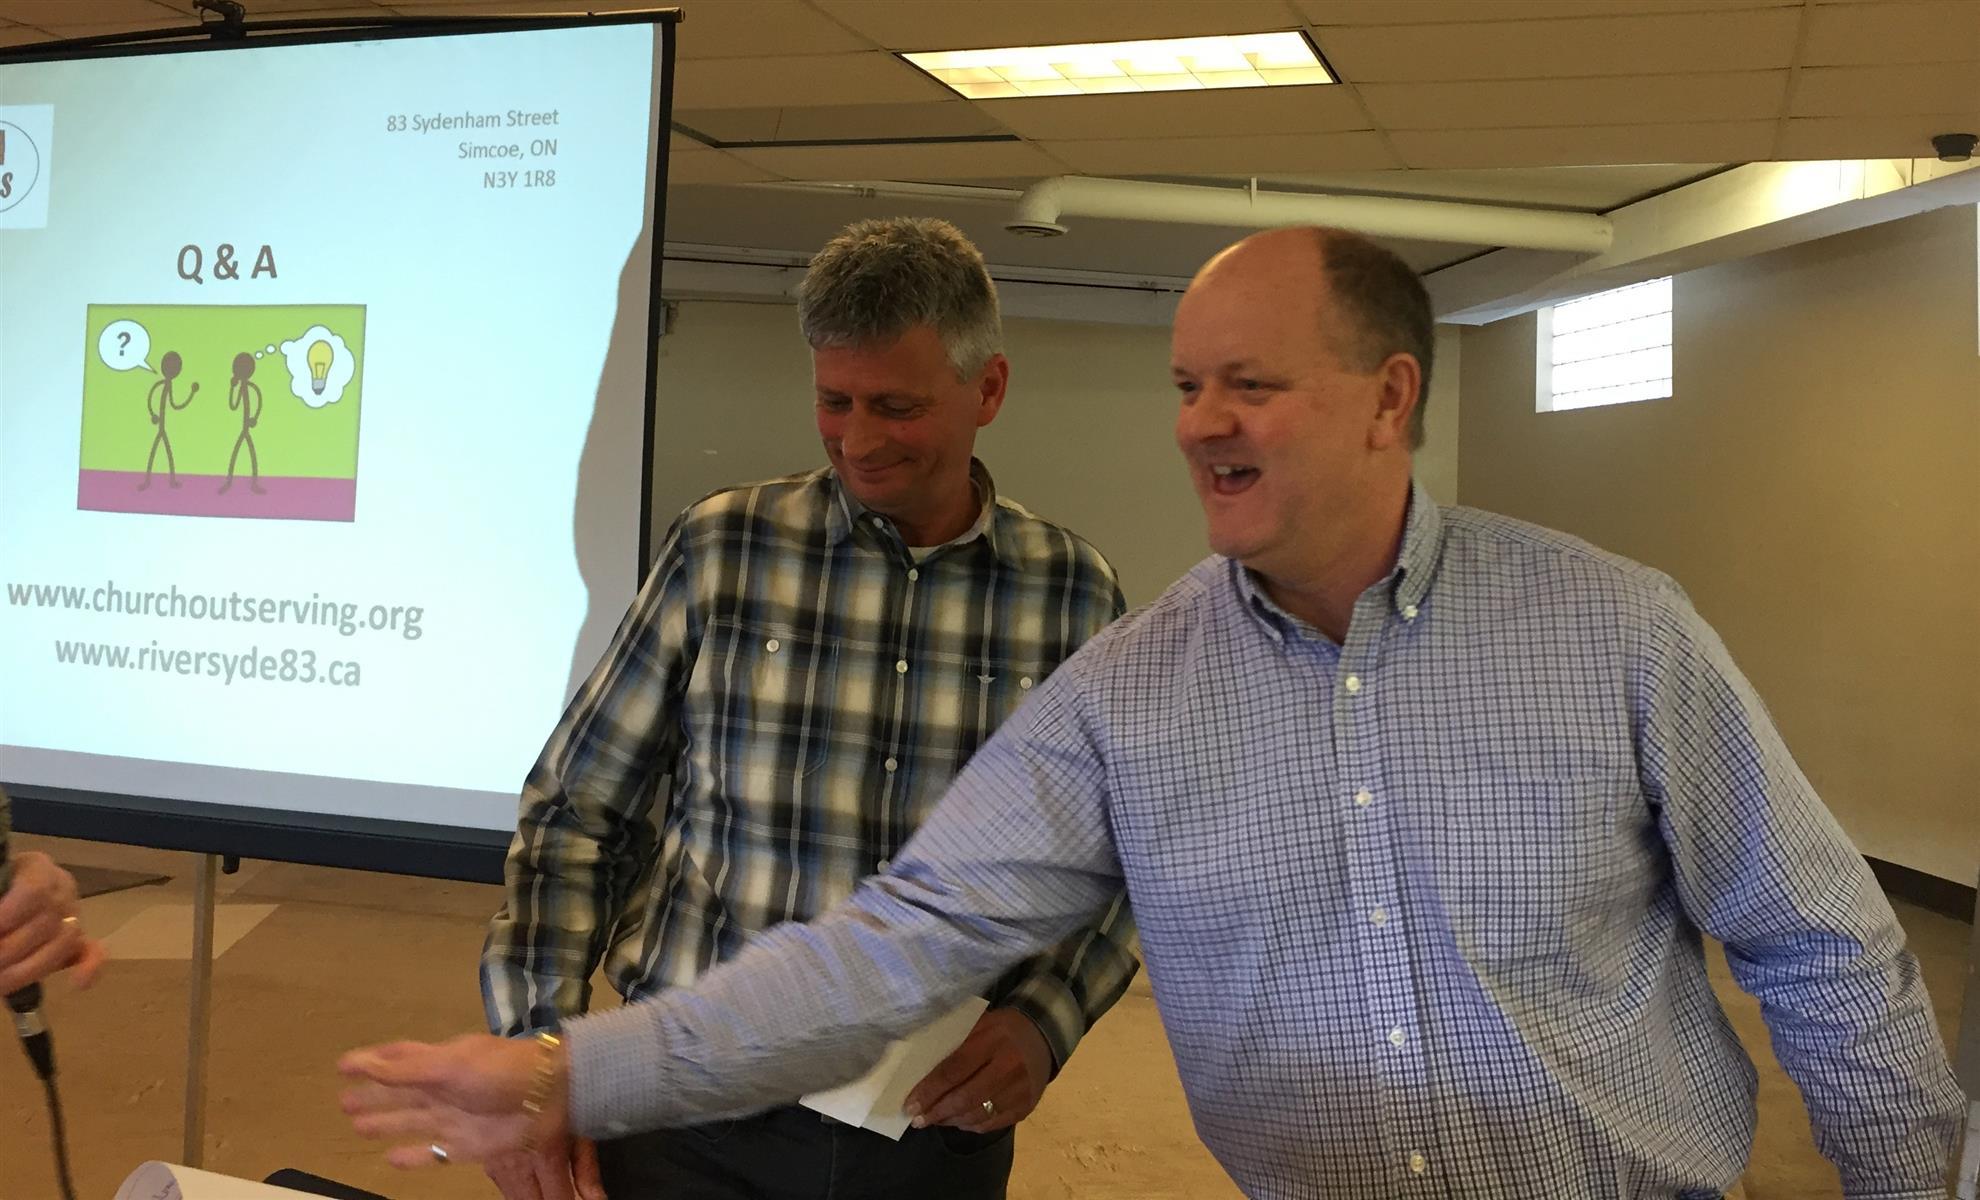 Rotarian John Valle thanks Eric Haverkamp, Board Chair of